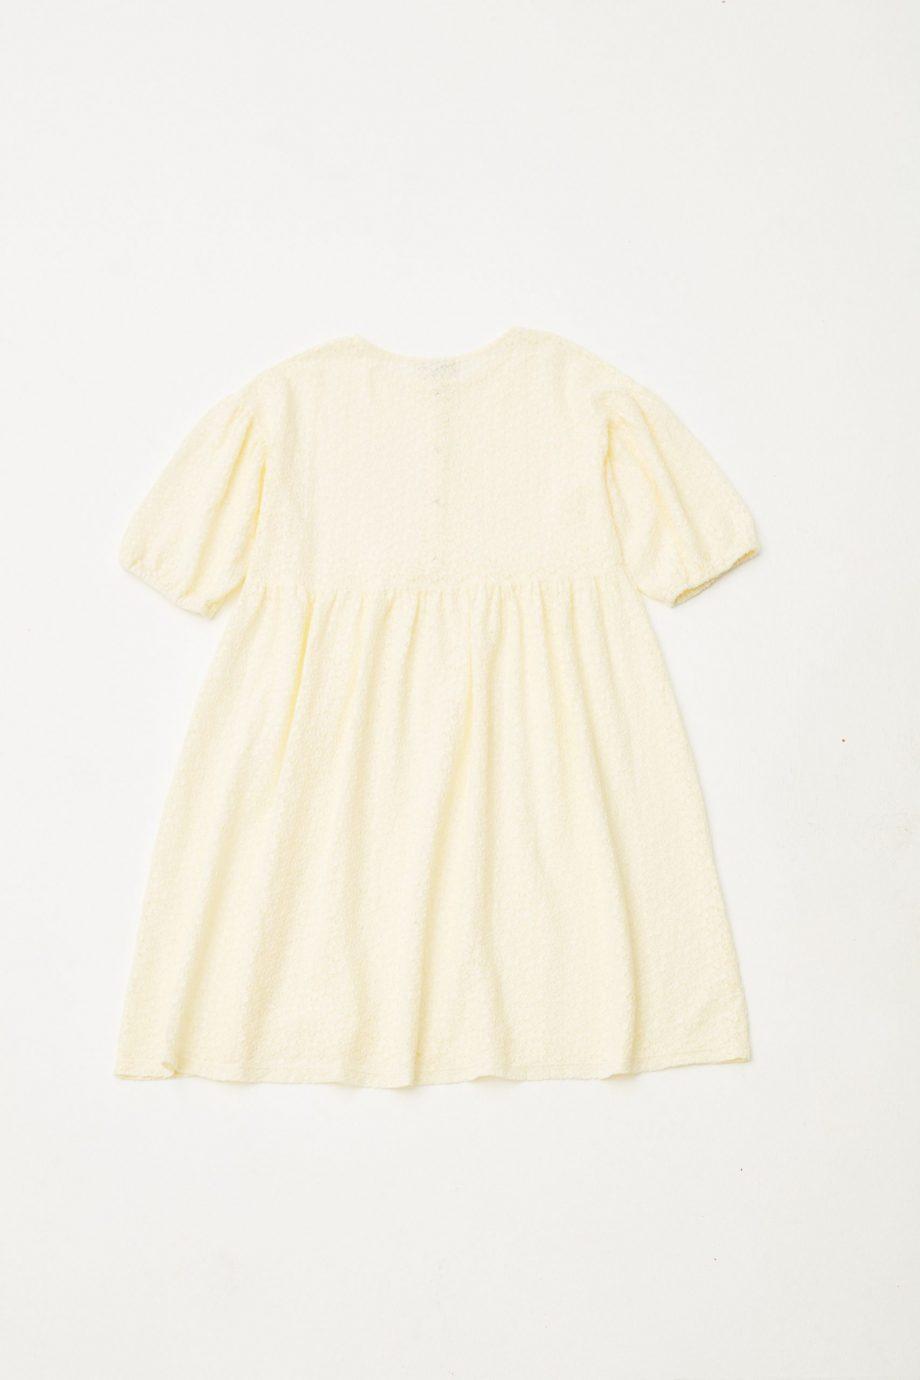 Lace Dress back